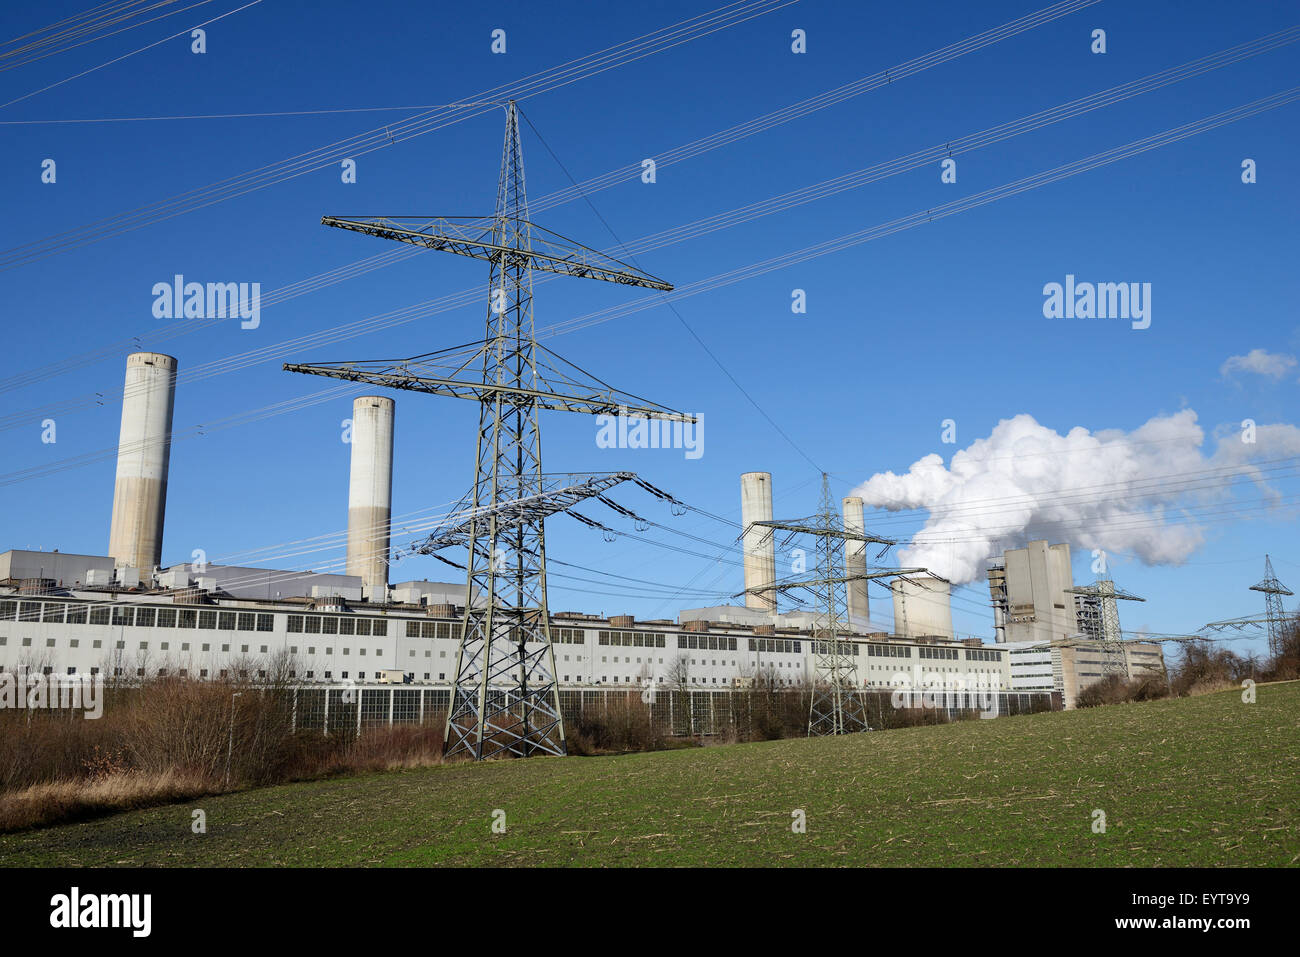 Brown coal power station Frimmersdorf, Germany, North Rhine-Westphalia, Grevenbroich Stock Photo